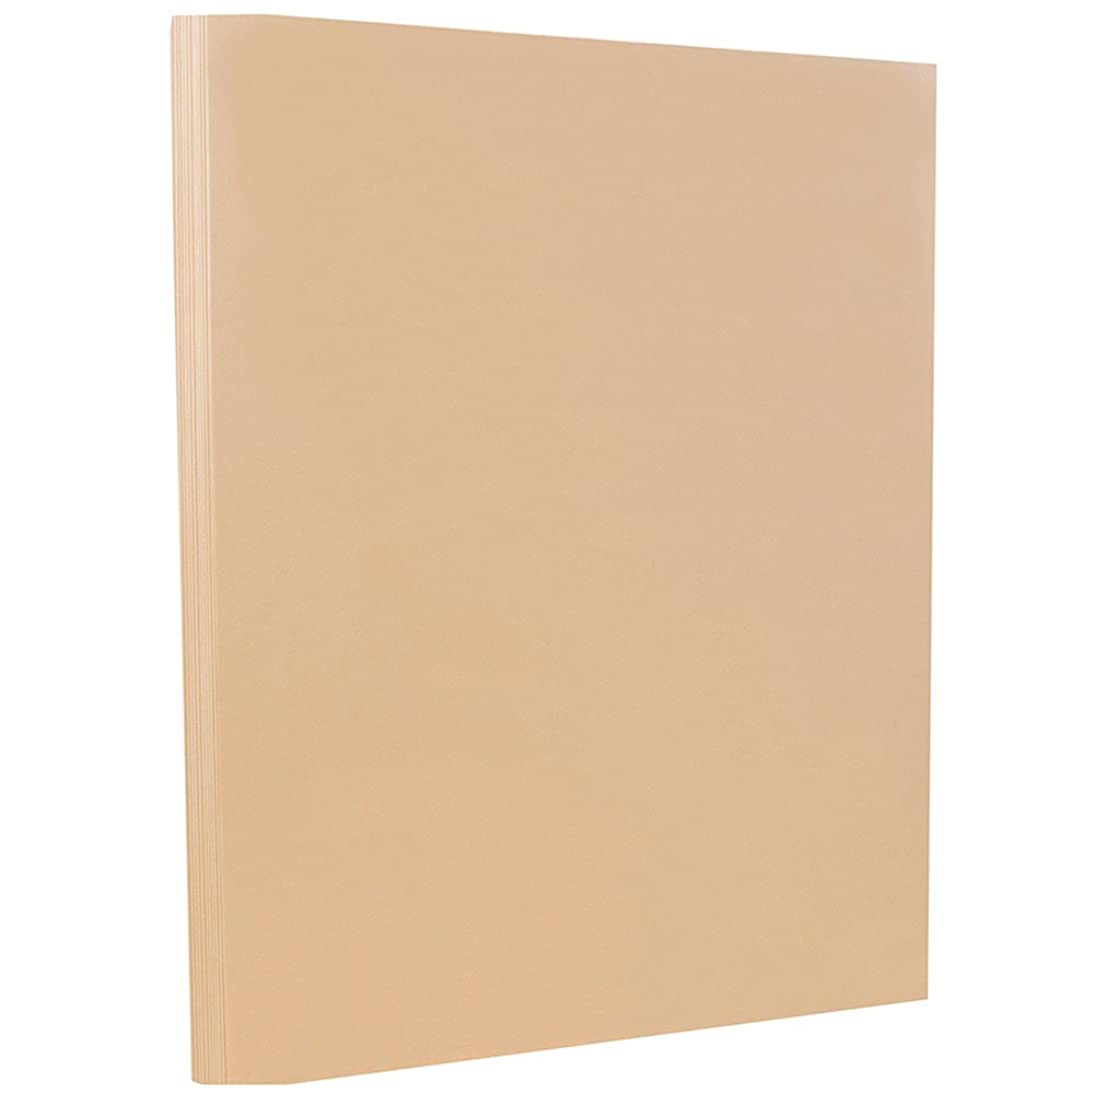 JAM PAPER Vellum Bristol 67lb Cardstock - 8.5 x 11 Letter Coverstock - Tan Brown - 50 Sheets/Pack